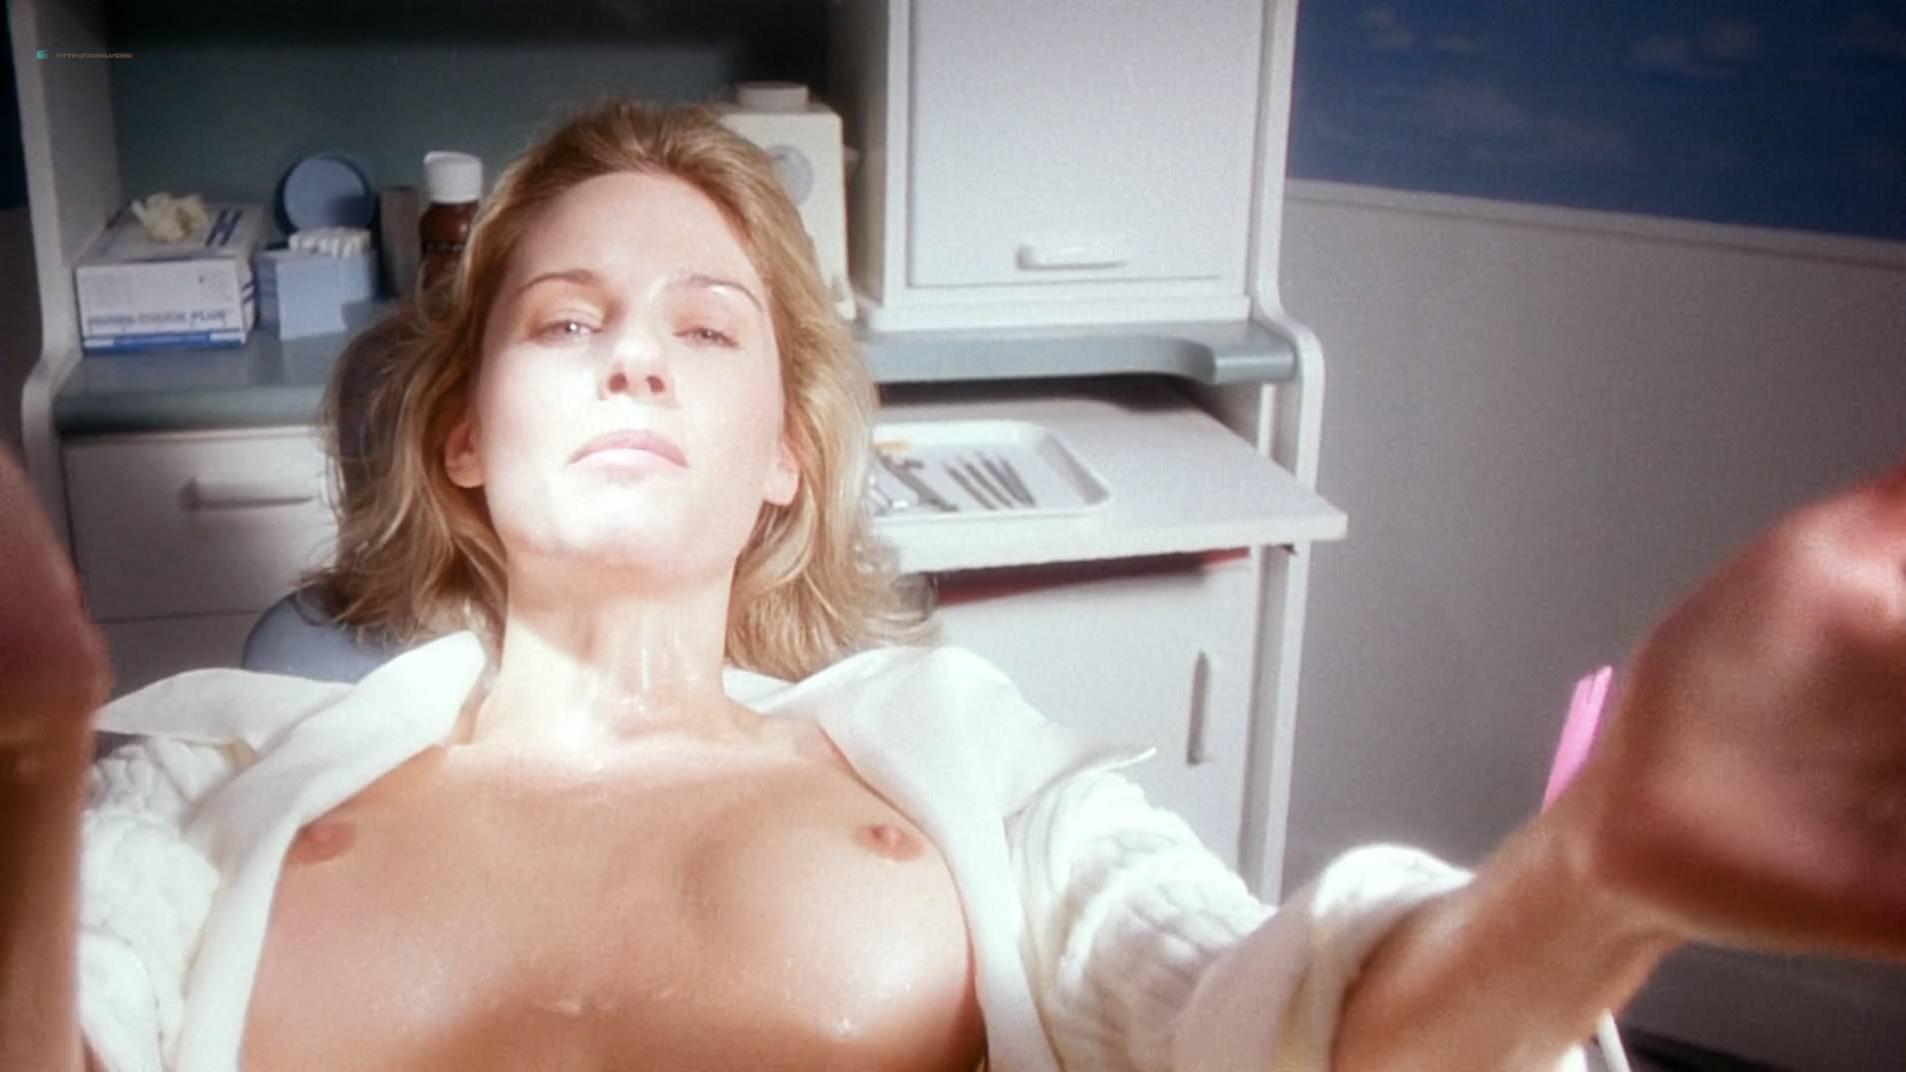 Linda Hoffman nude, Christa Sauls nude - The Dentist (1996)